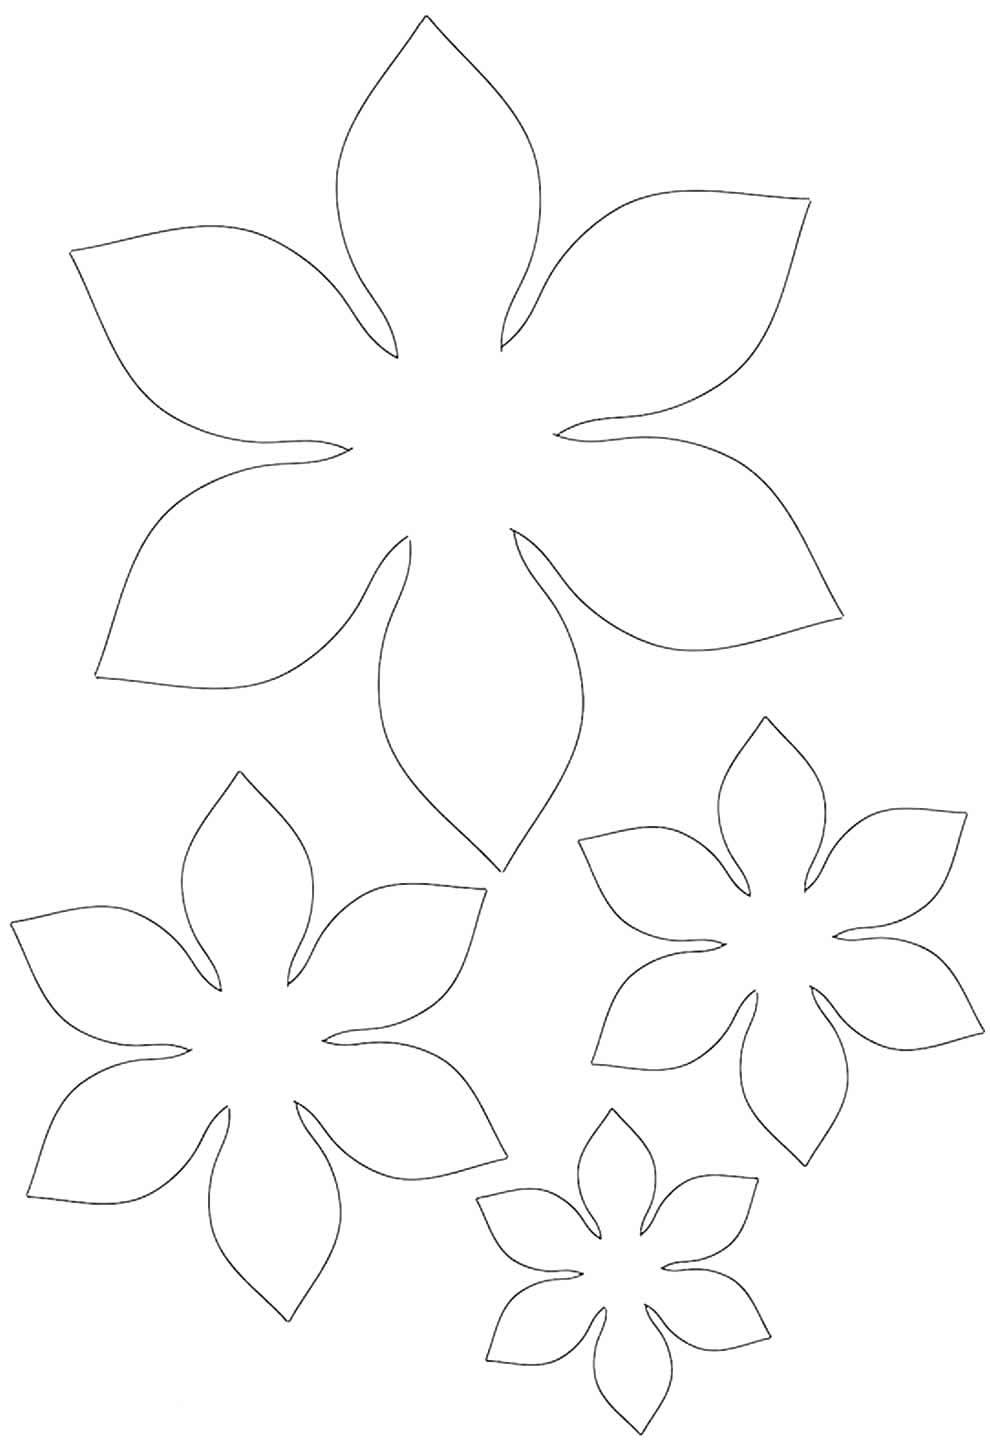 Molde de pétalas de flor